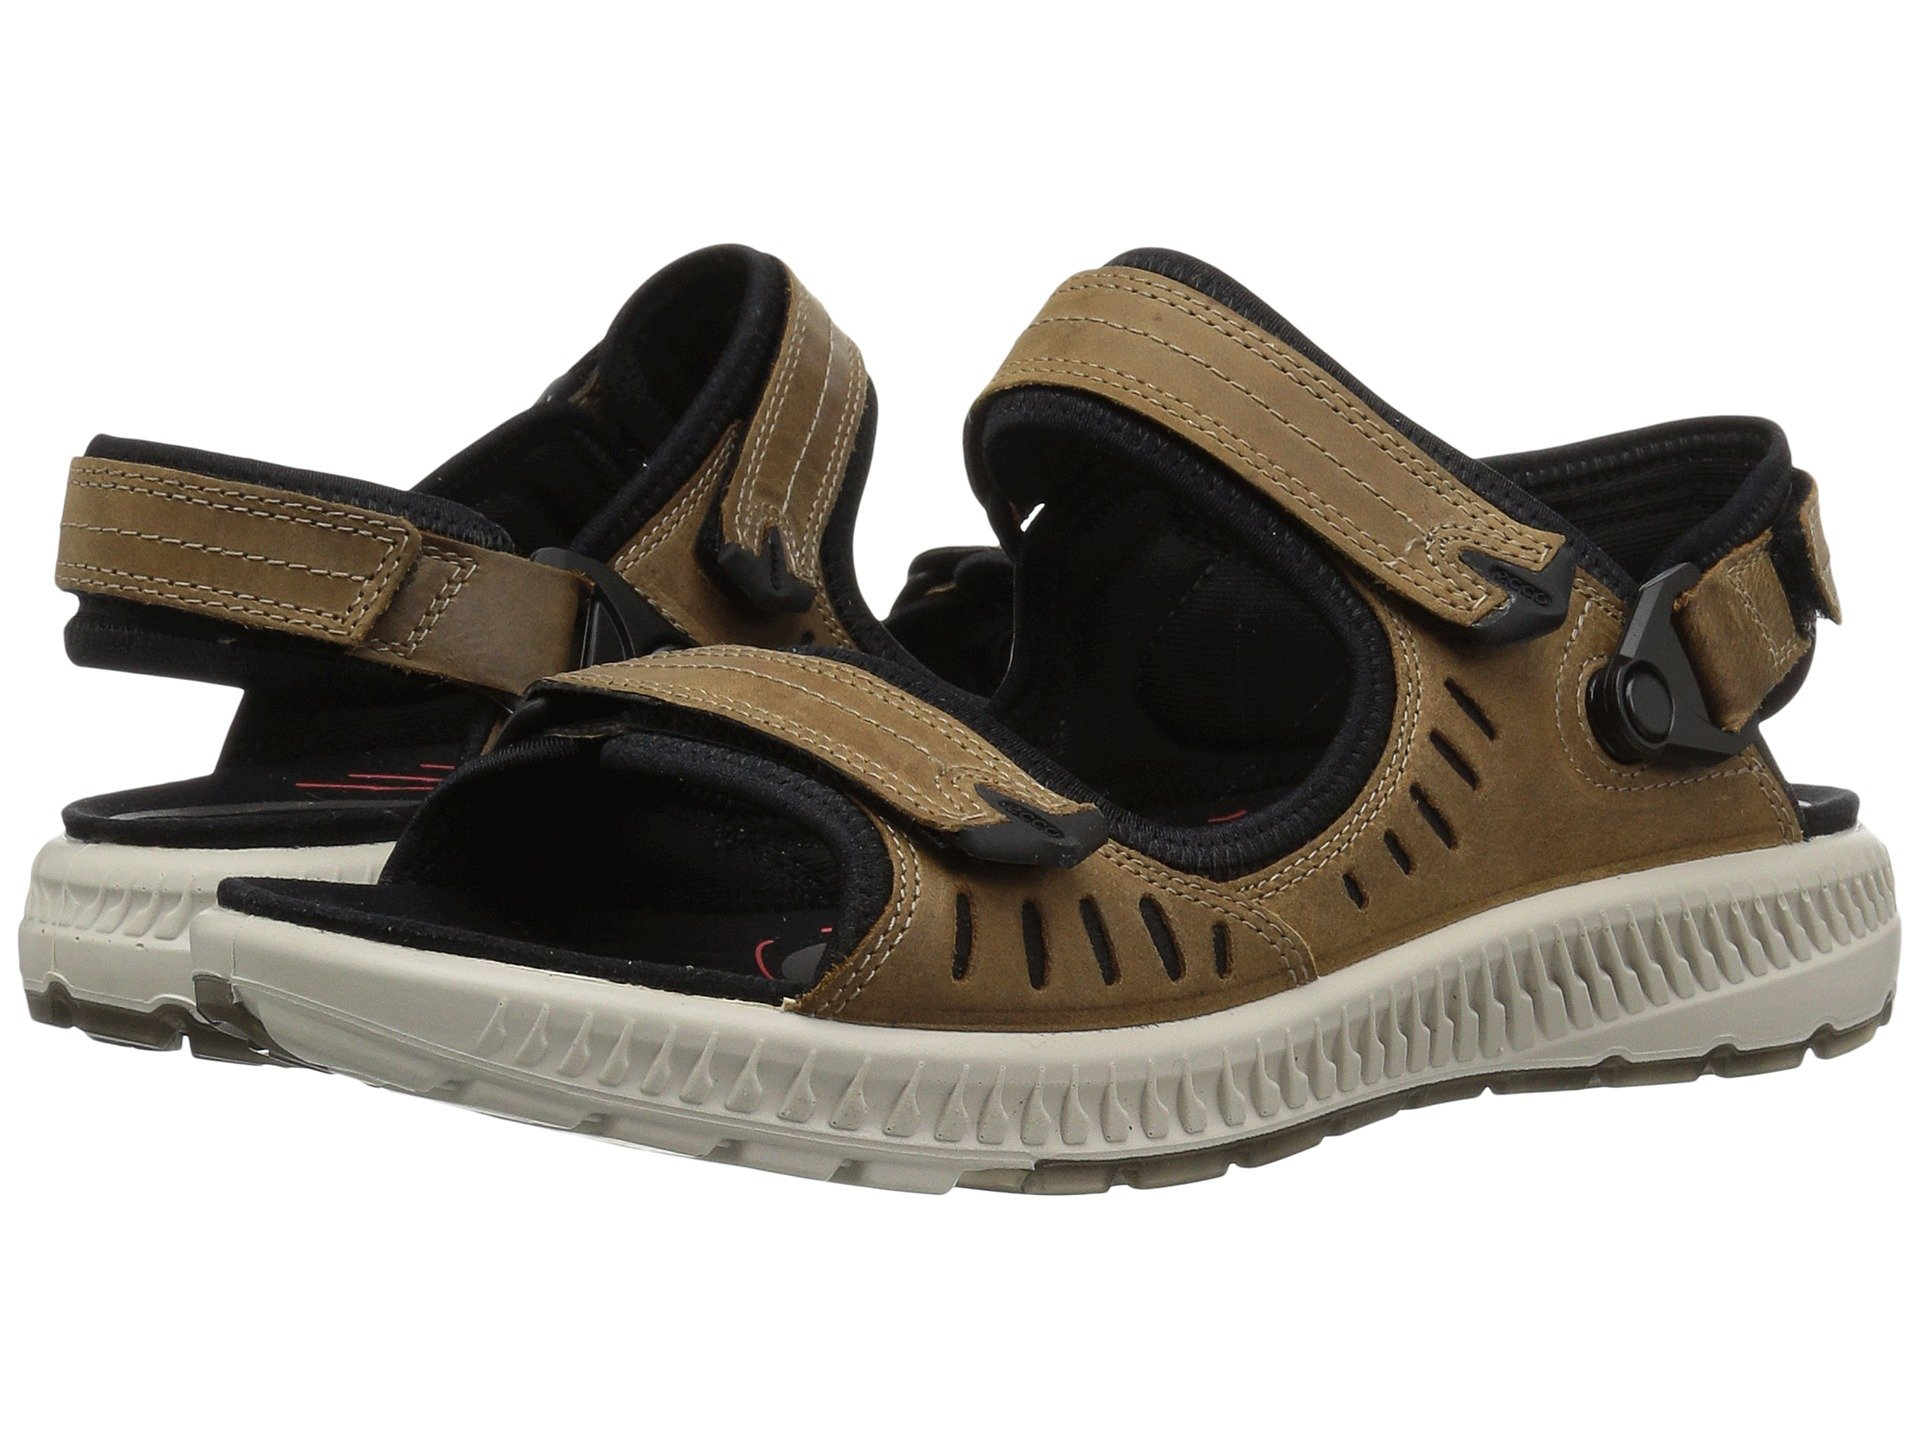 Sandal Ecco Terra Camel 2s Sport wqTqS8